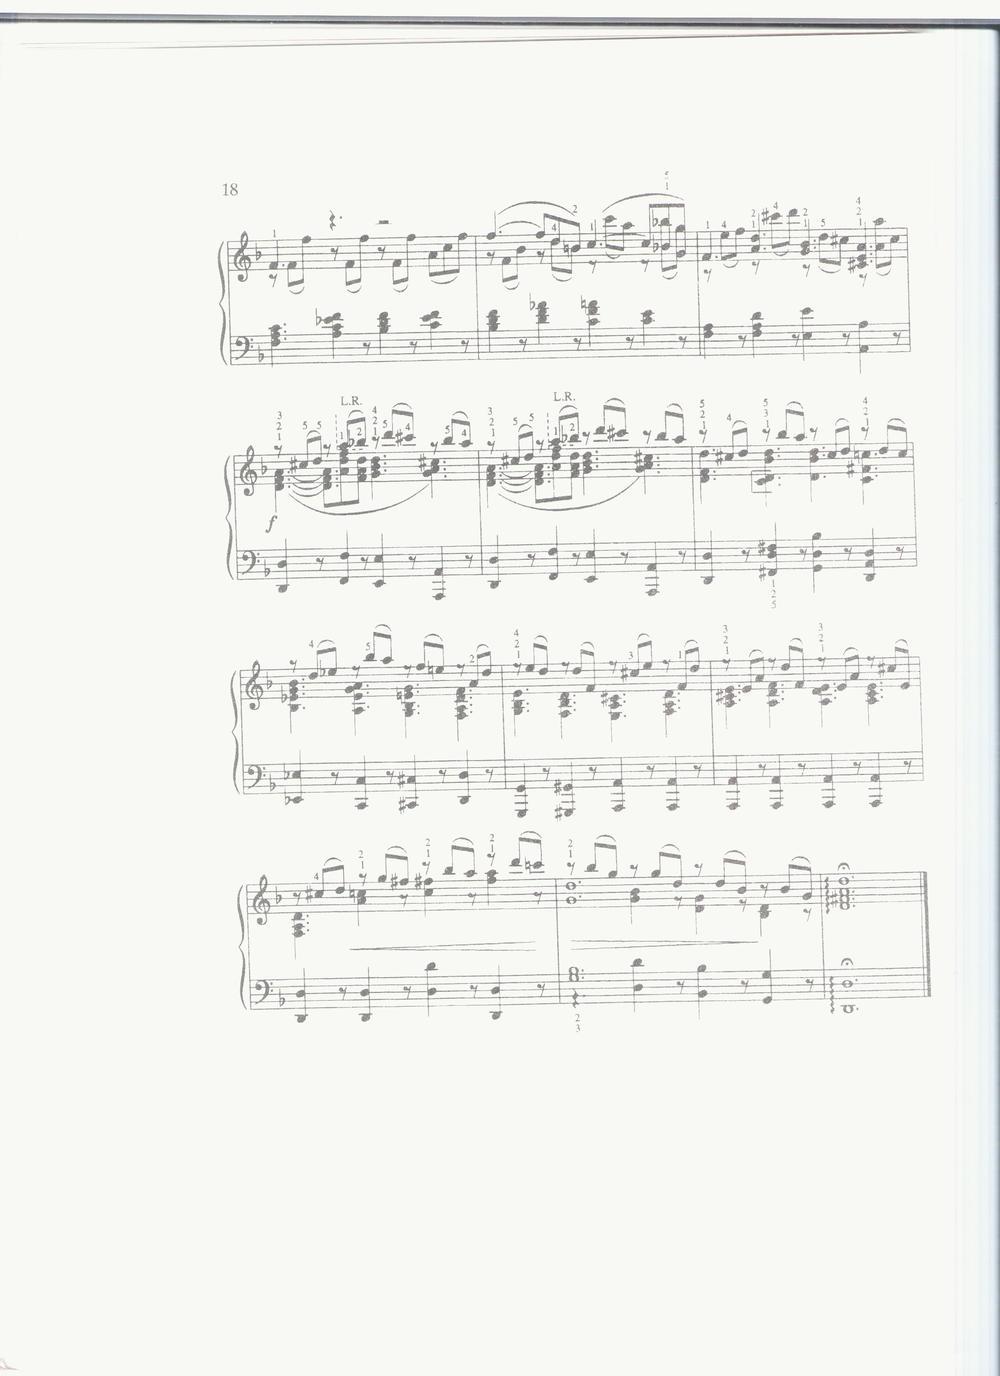 Lacrimosa_Requirem_Mozart_3